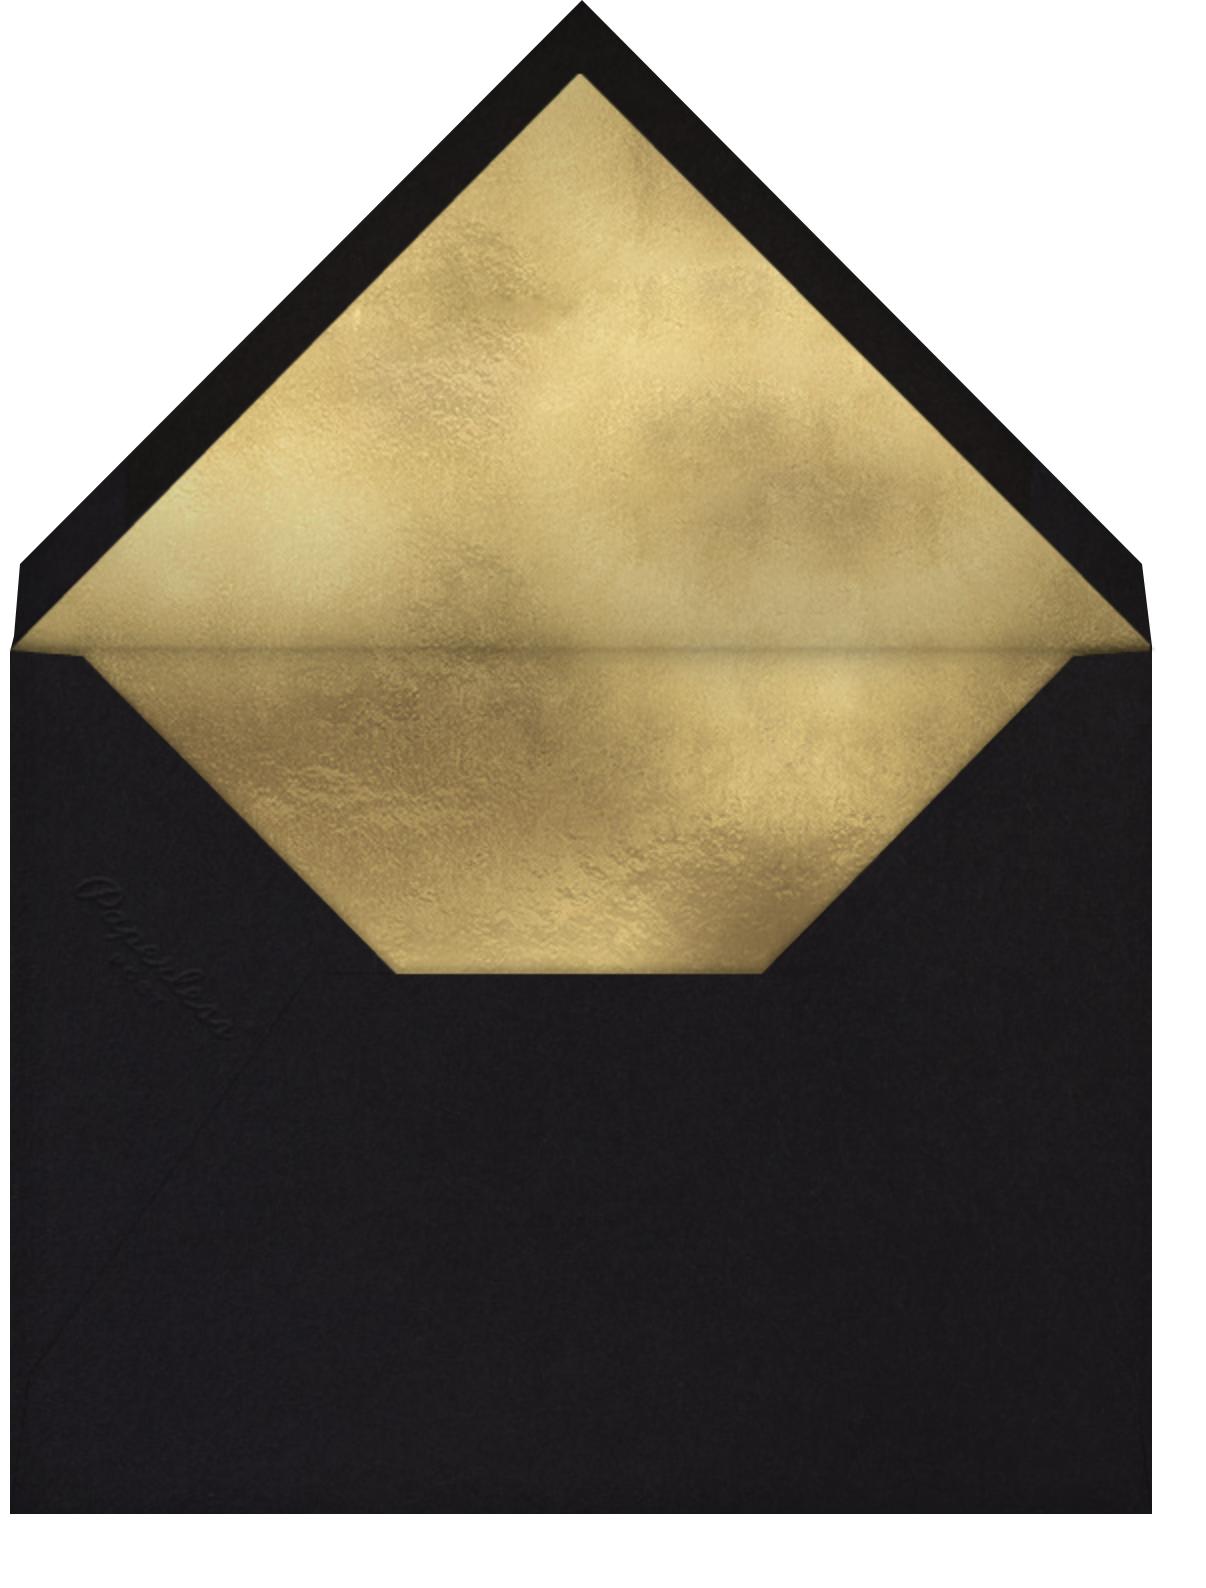 Tefillin - Paperless Post - Bat and bar mitzvah - envelope back